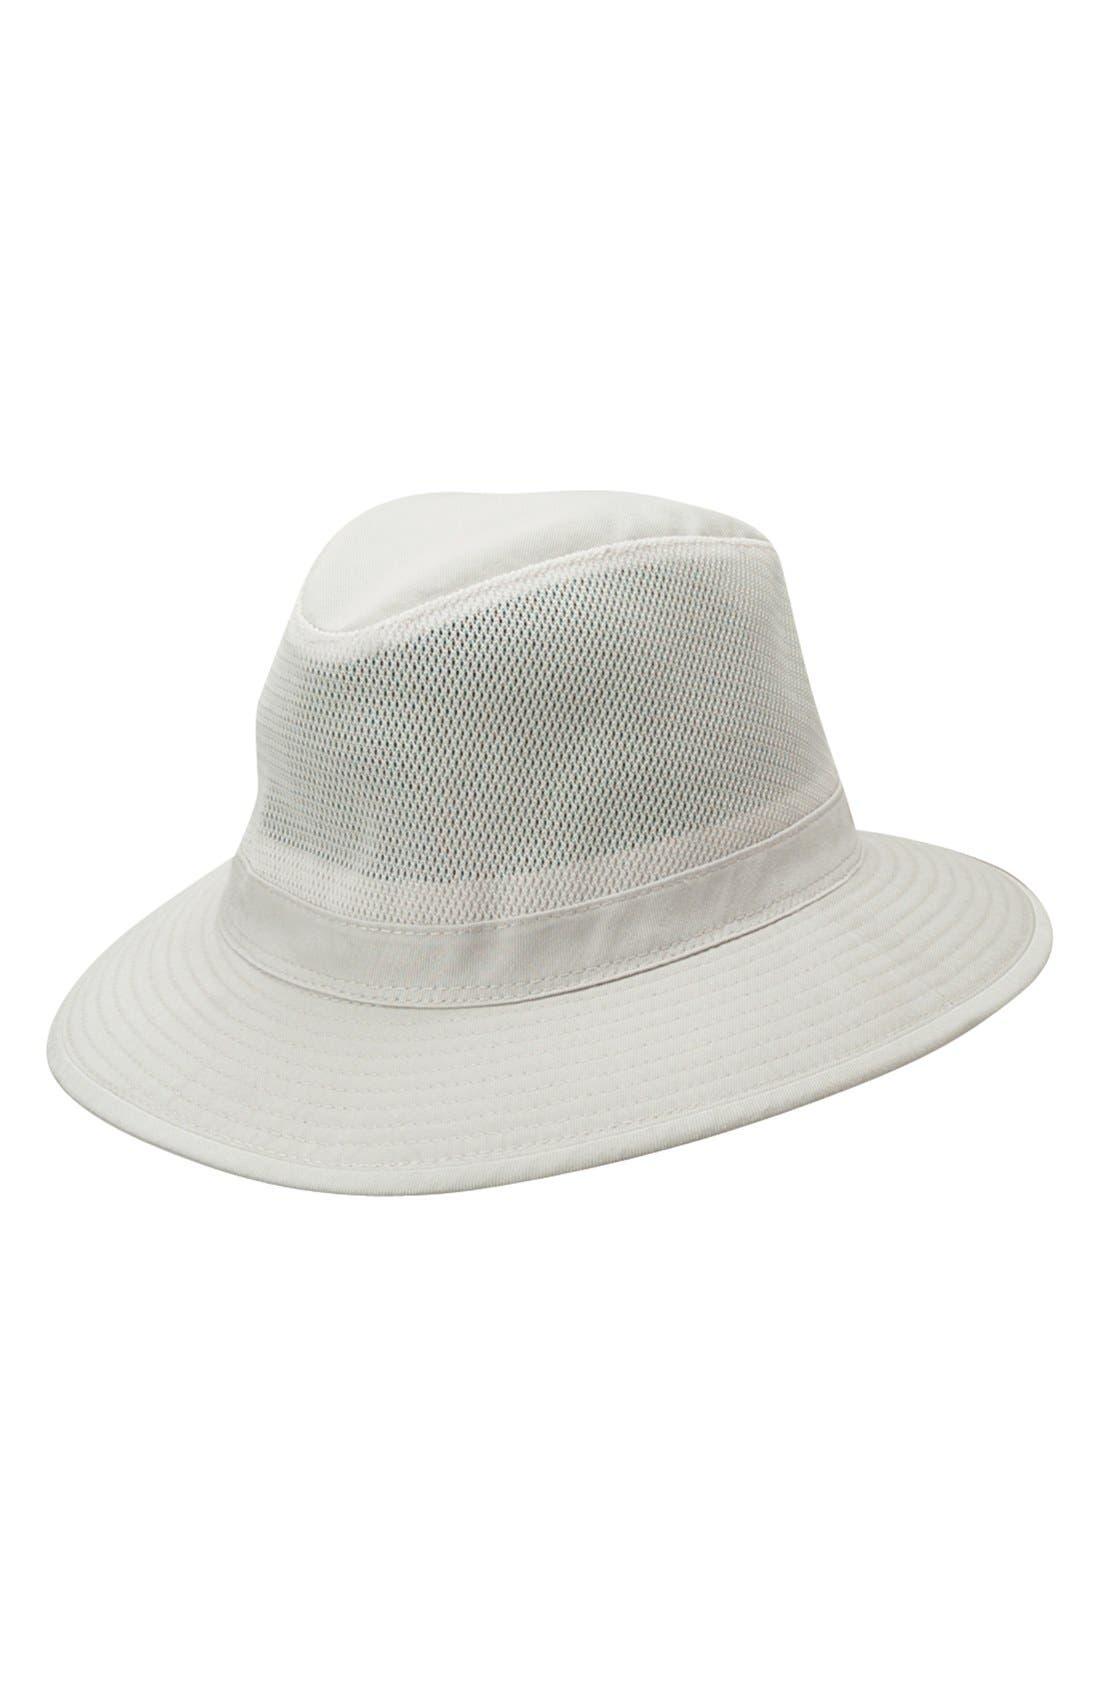 1b664b7197b21 dorfman pacific fedoras hats for men - Buy best men s dorfman pacific  fedoras hats on Cools.com Shop